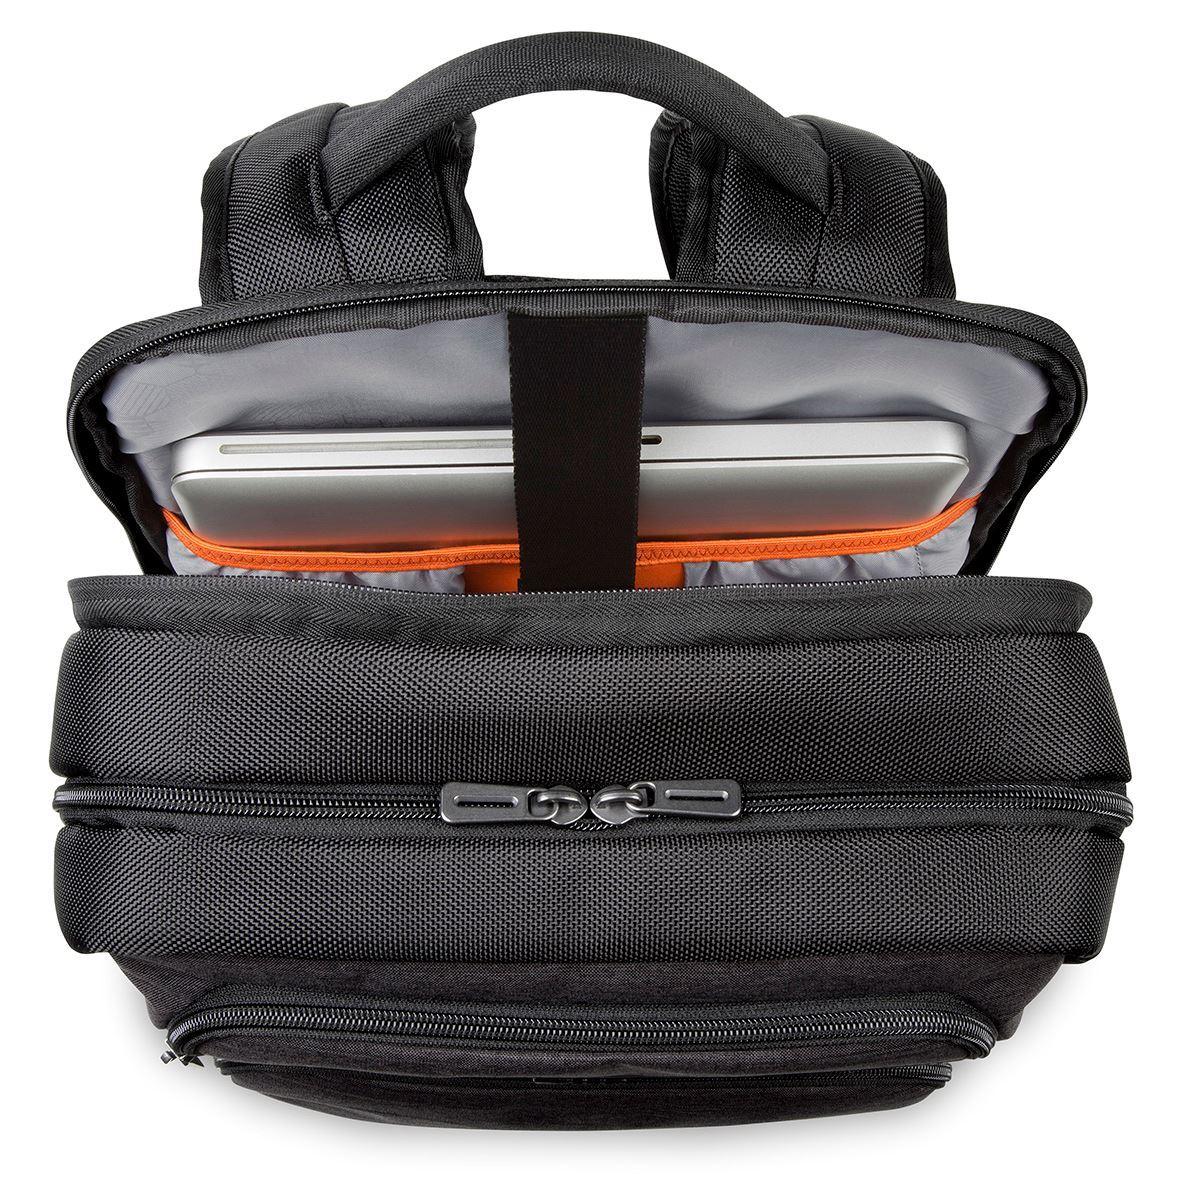 Citysmart 12 5 13 13 3 14 15 15 6 Advanced Laptop Backpack Black Grey